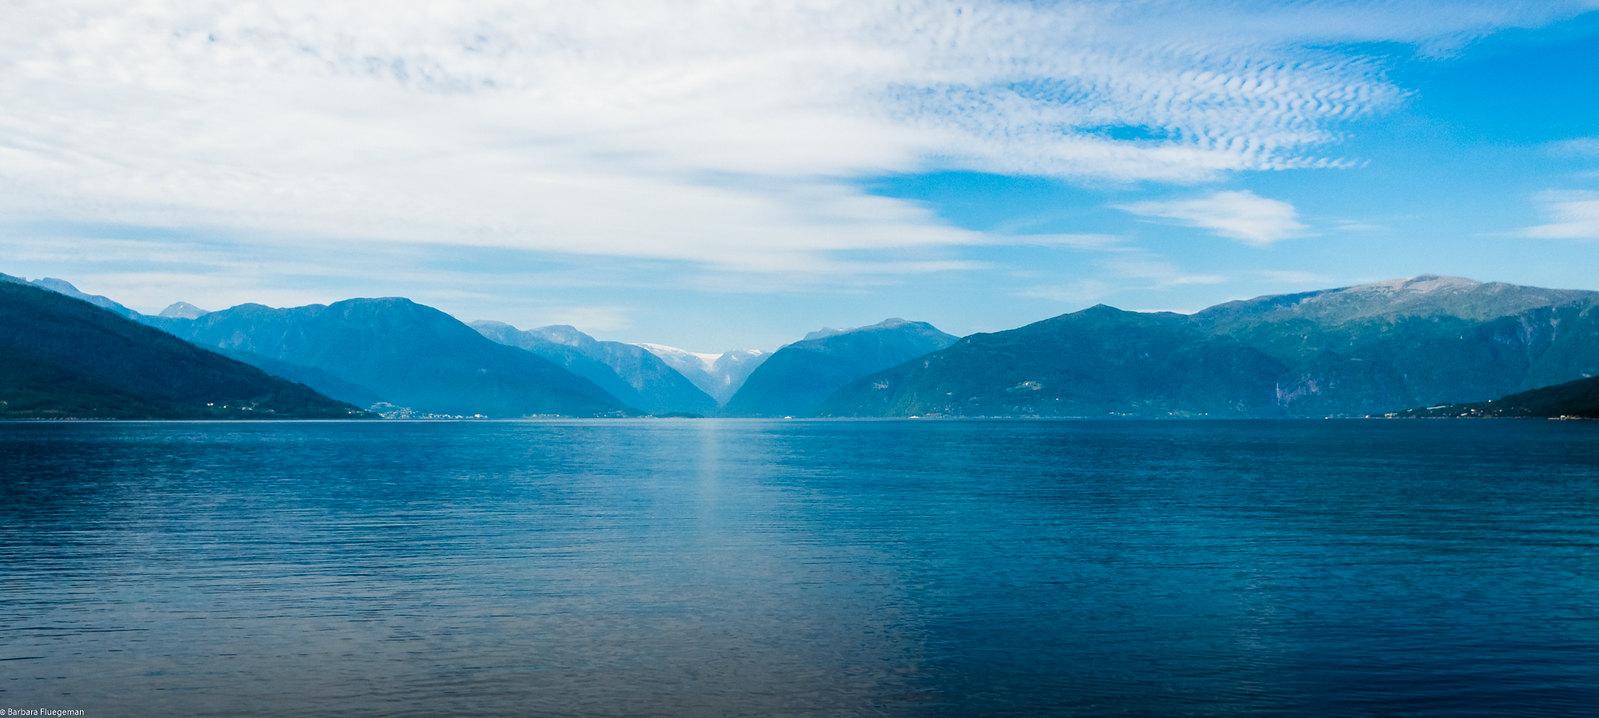 Blue on blue - Sognefjord near Vik